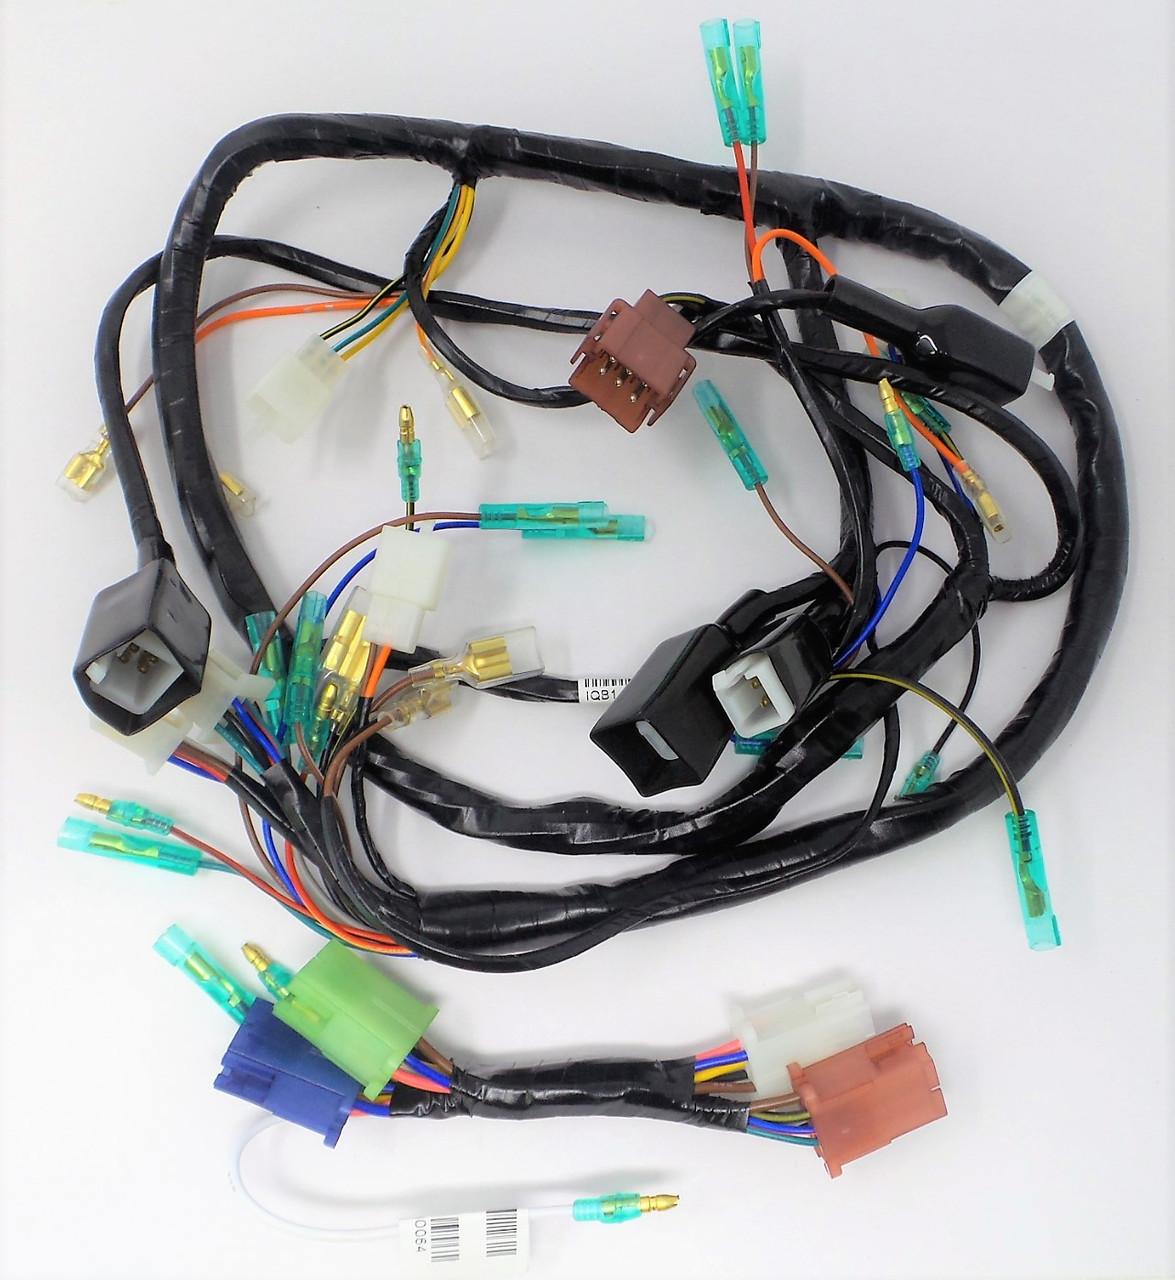 Kz900 Wiring Harness